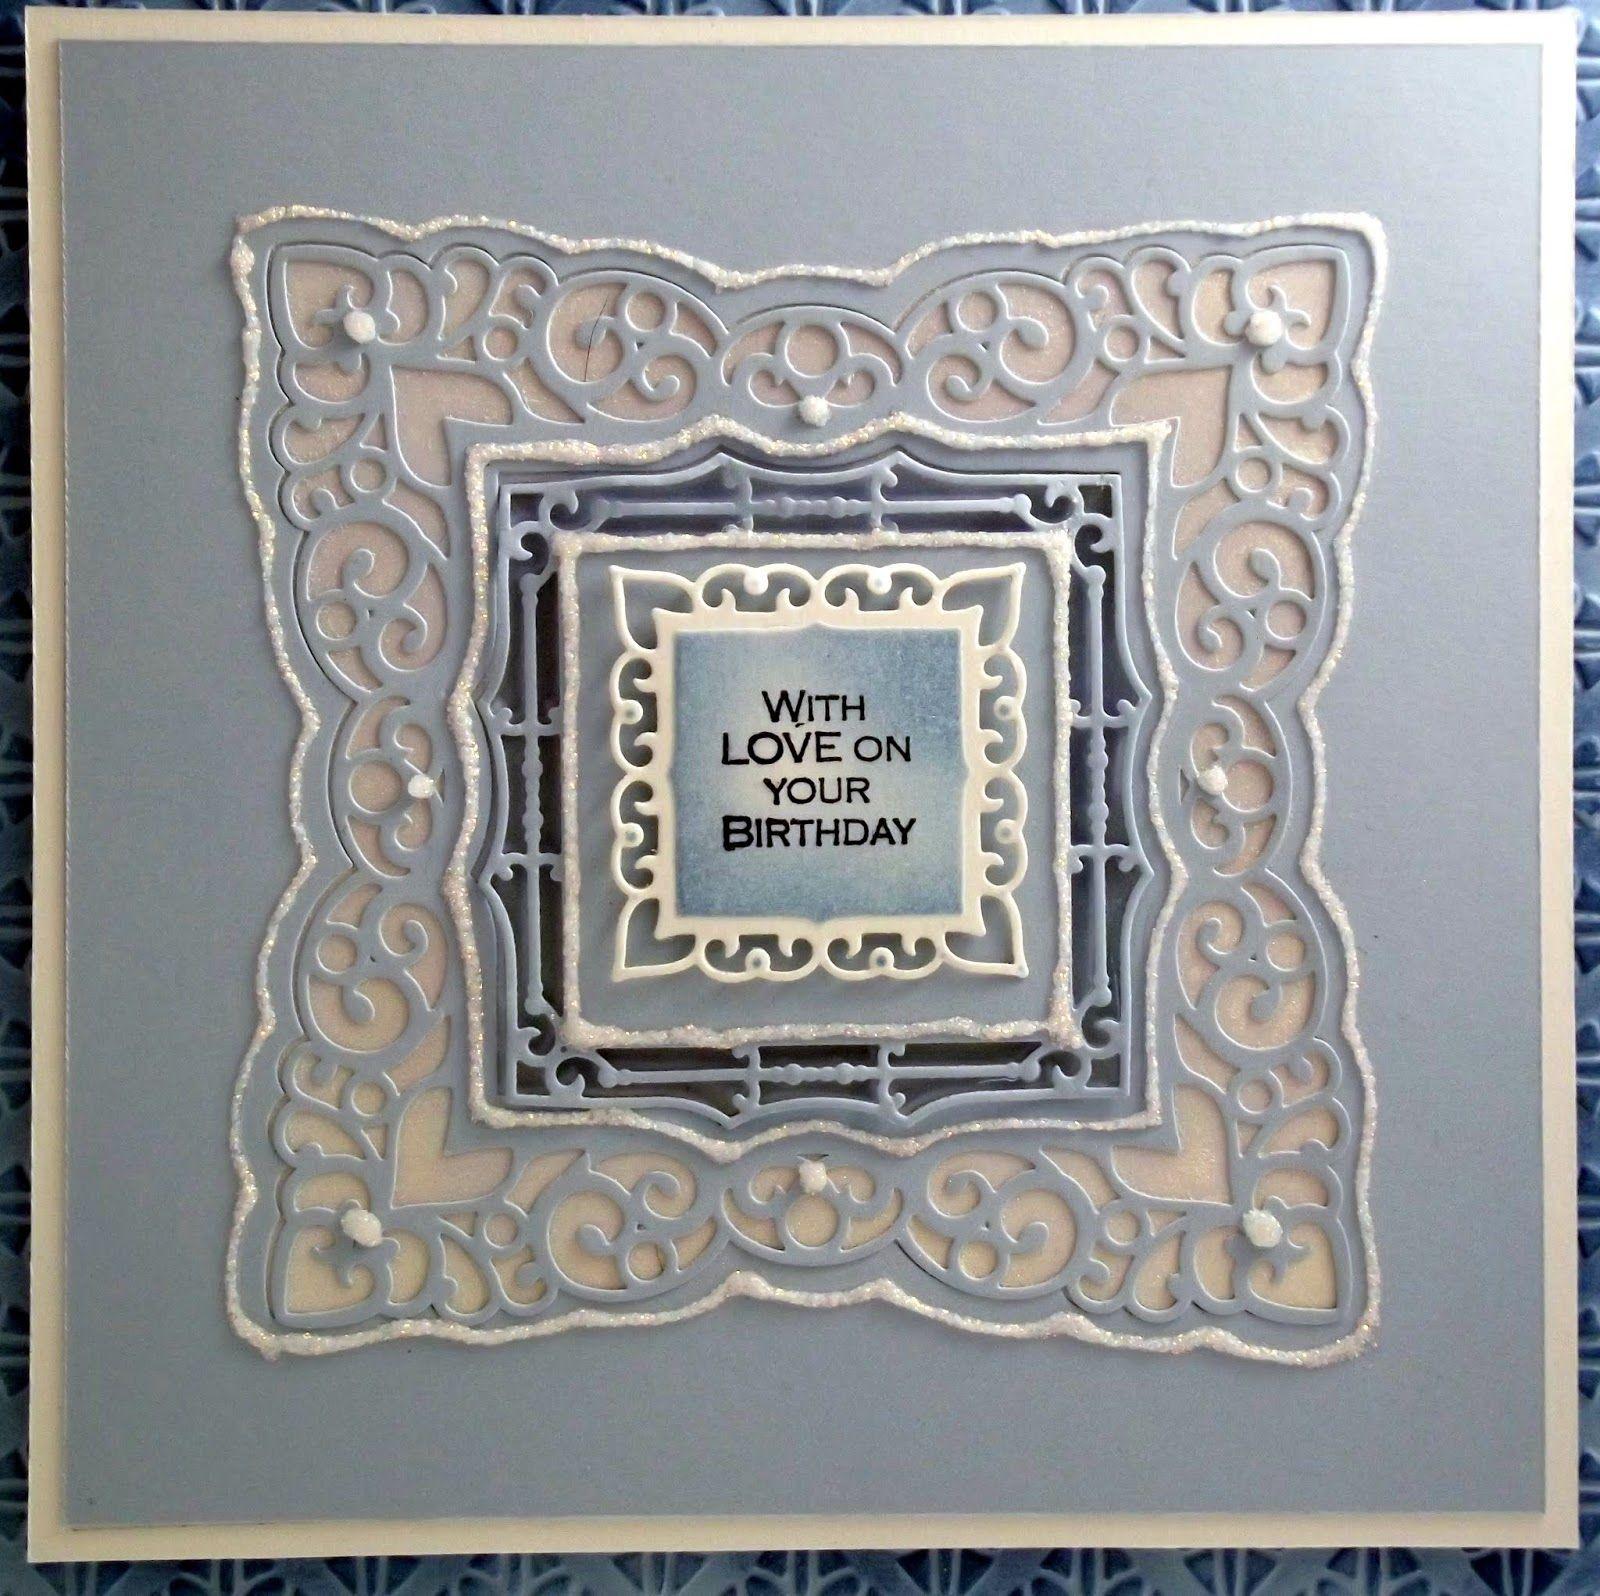 John Next Door Spellbinders labels 42, CE Clear stamps Fern frames elements stamp set, Cosmic Shimmer Aurora Twinkles and Garden Floral mica set, Sky Blue & coconut white foundation card.